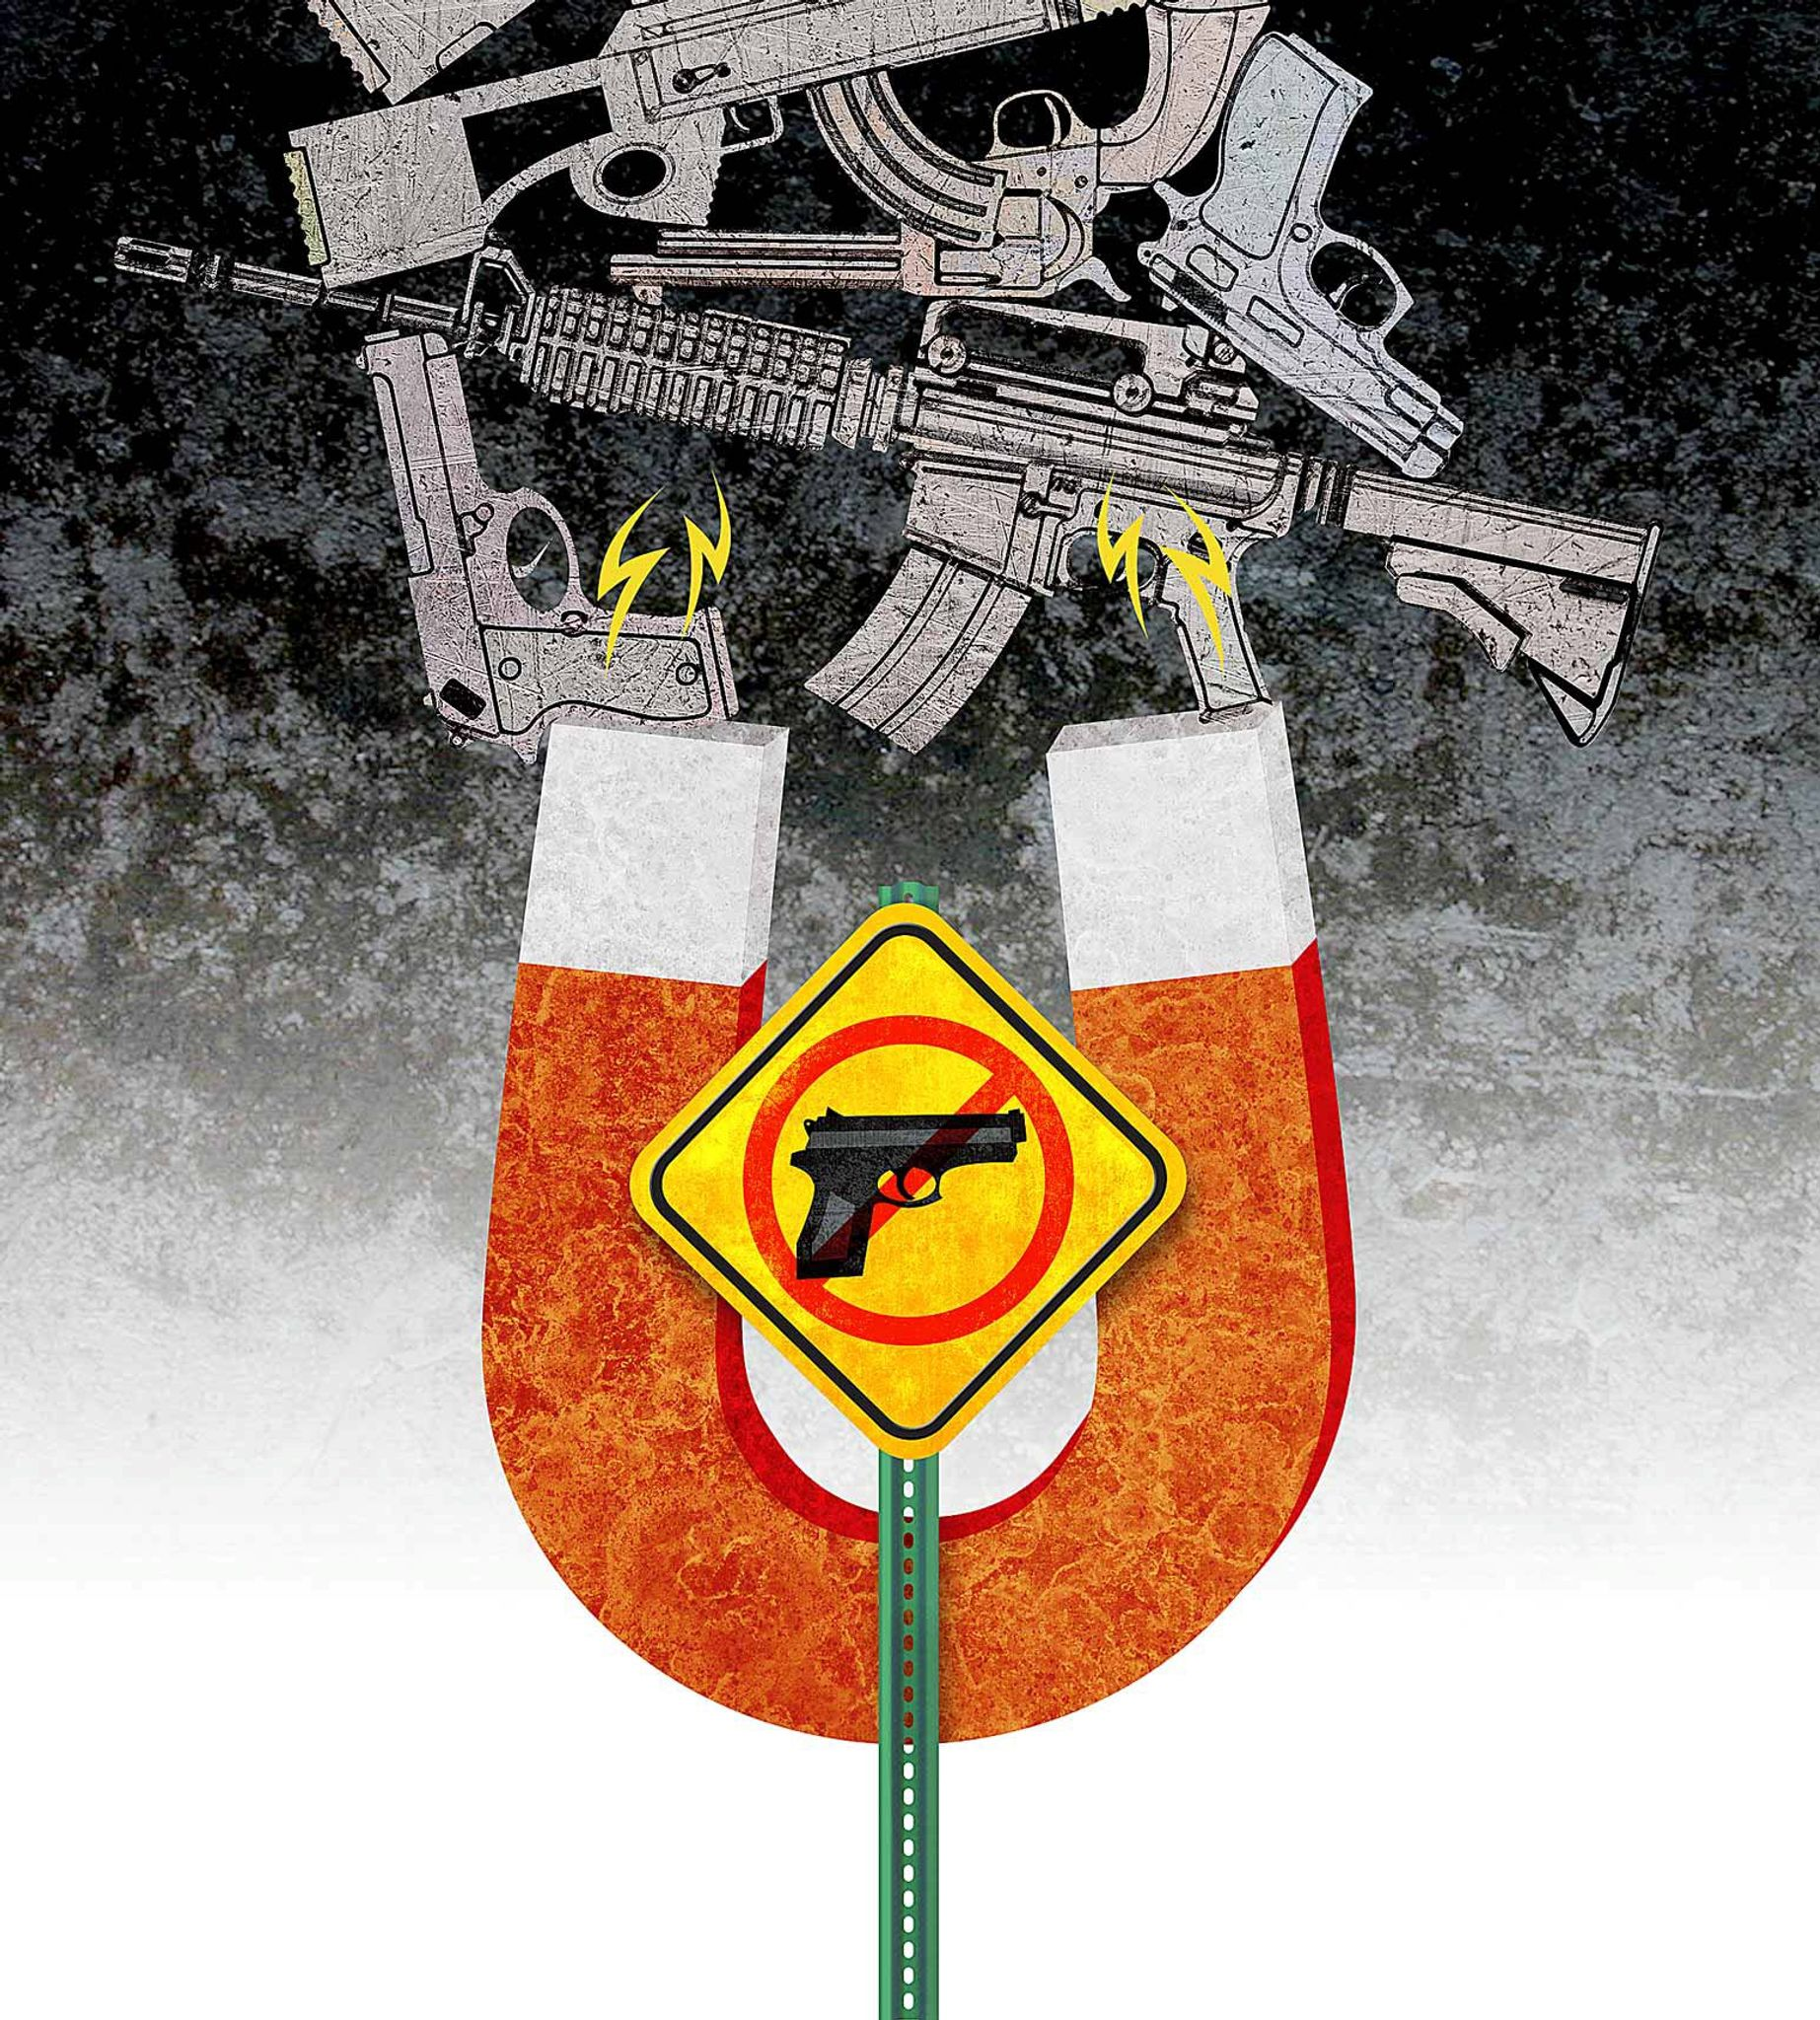 Disarming legislators makes them targets for terrorists, criminals